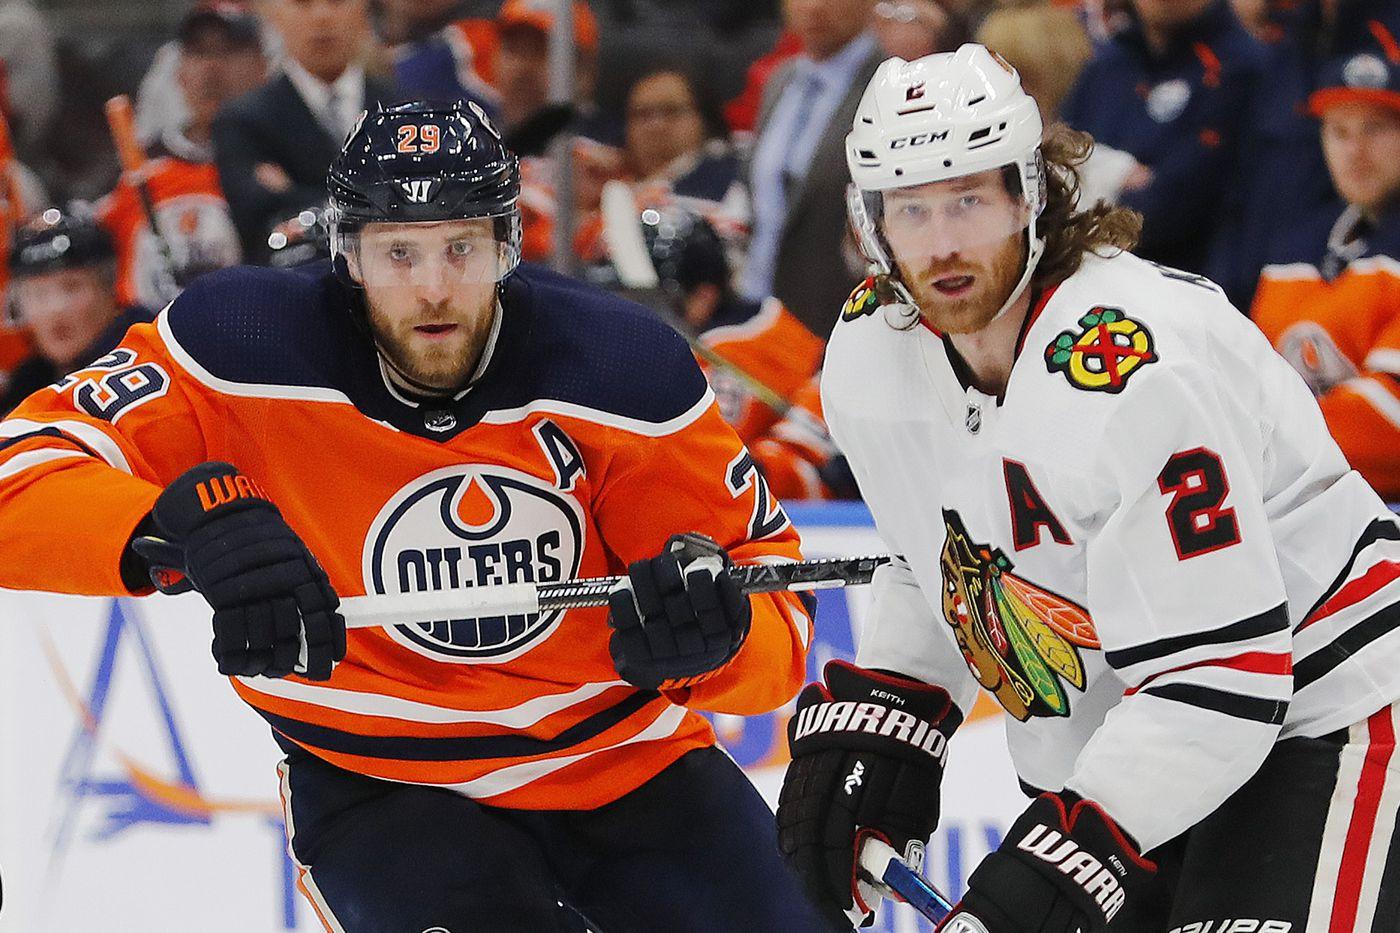 2020 Stanley Cup Qualifiers Schedule Chicago Blackhawks Vs Edmonton Oilers Second City Hockey